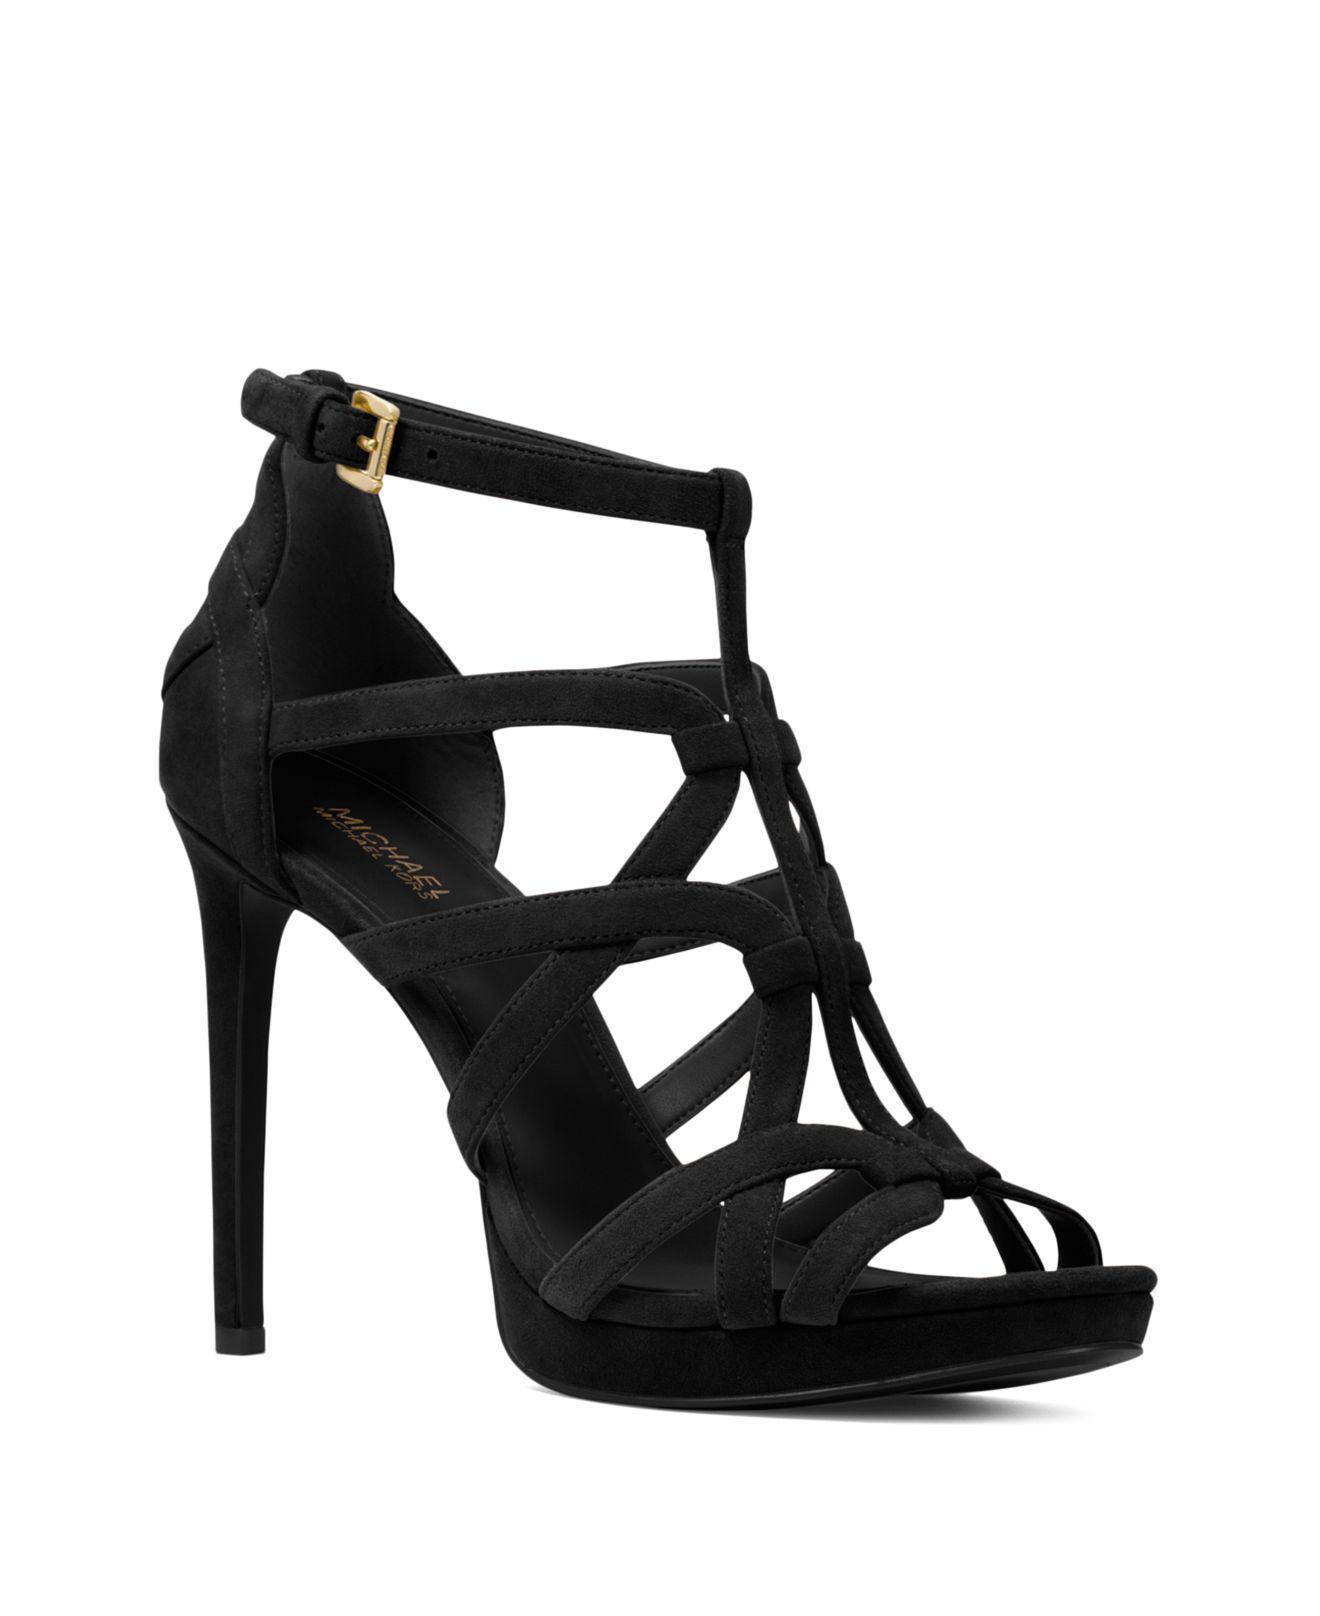 Michael Kors Women's Sandra Strappy Leather Platform High-Heel Sandals 7gTjP7M3g